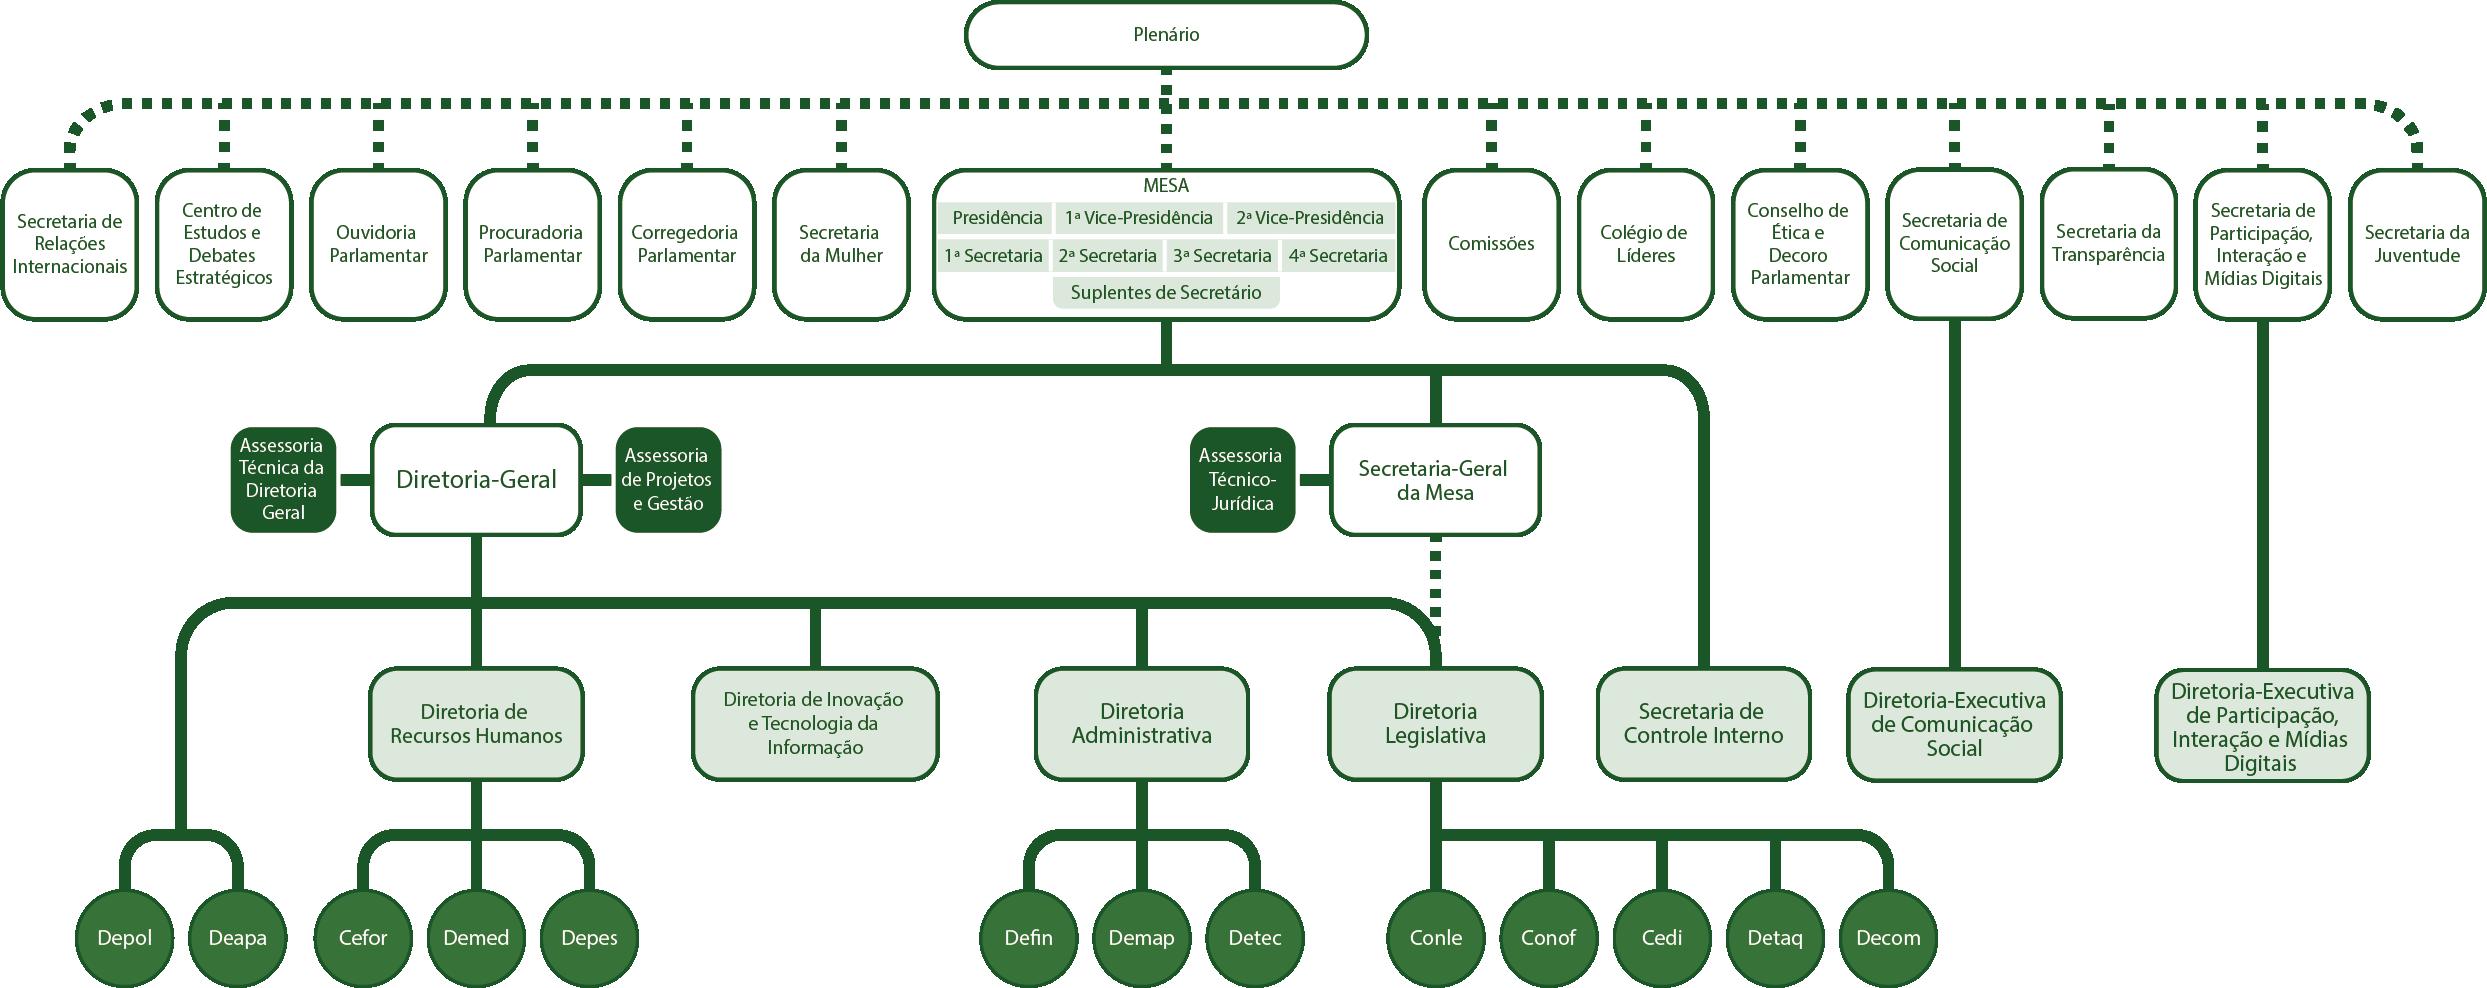 Organograma - Estrutura Administrativa